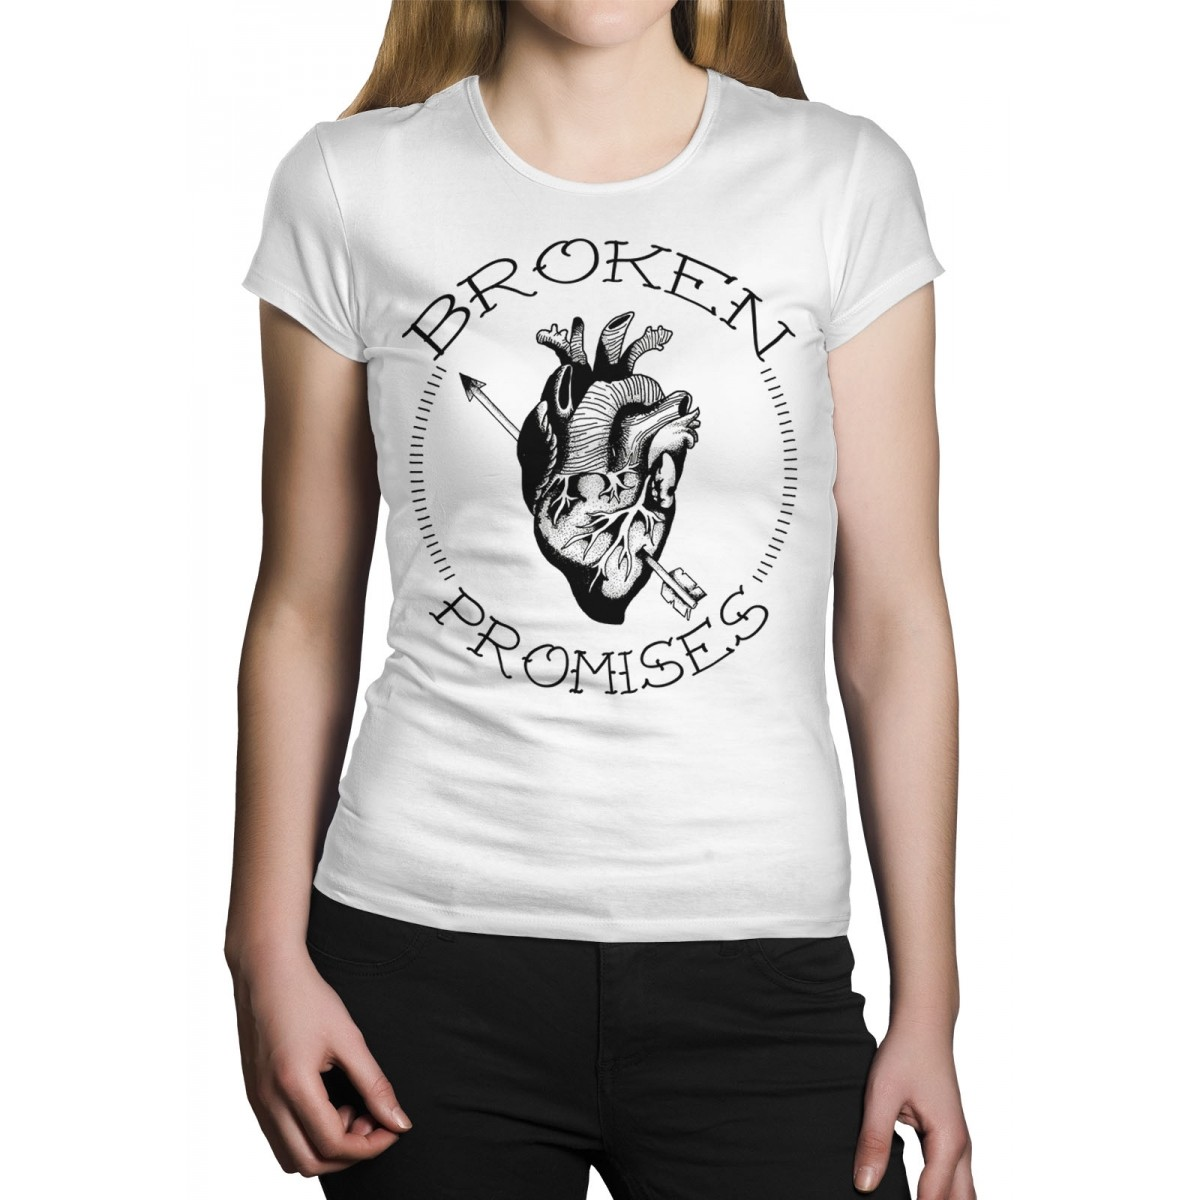 Camiseta HShop Broken Promisses Branco  - HShop